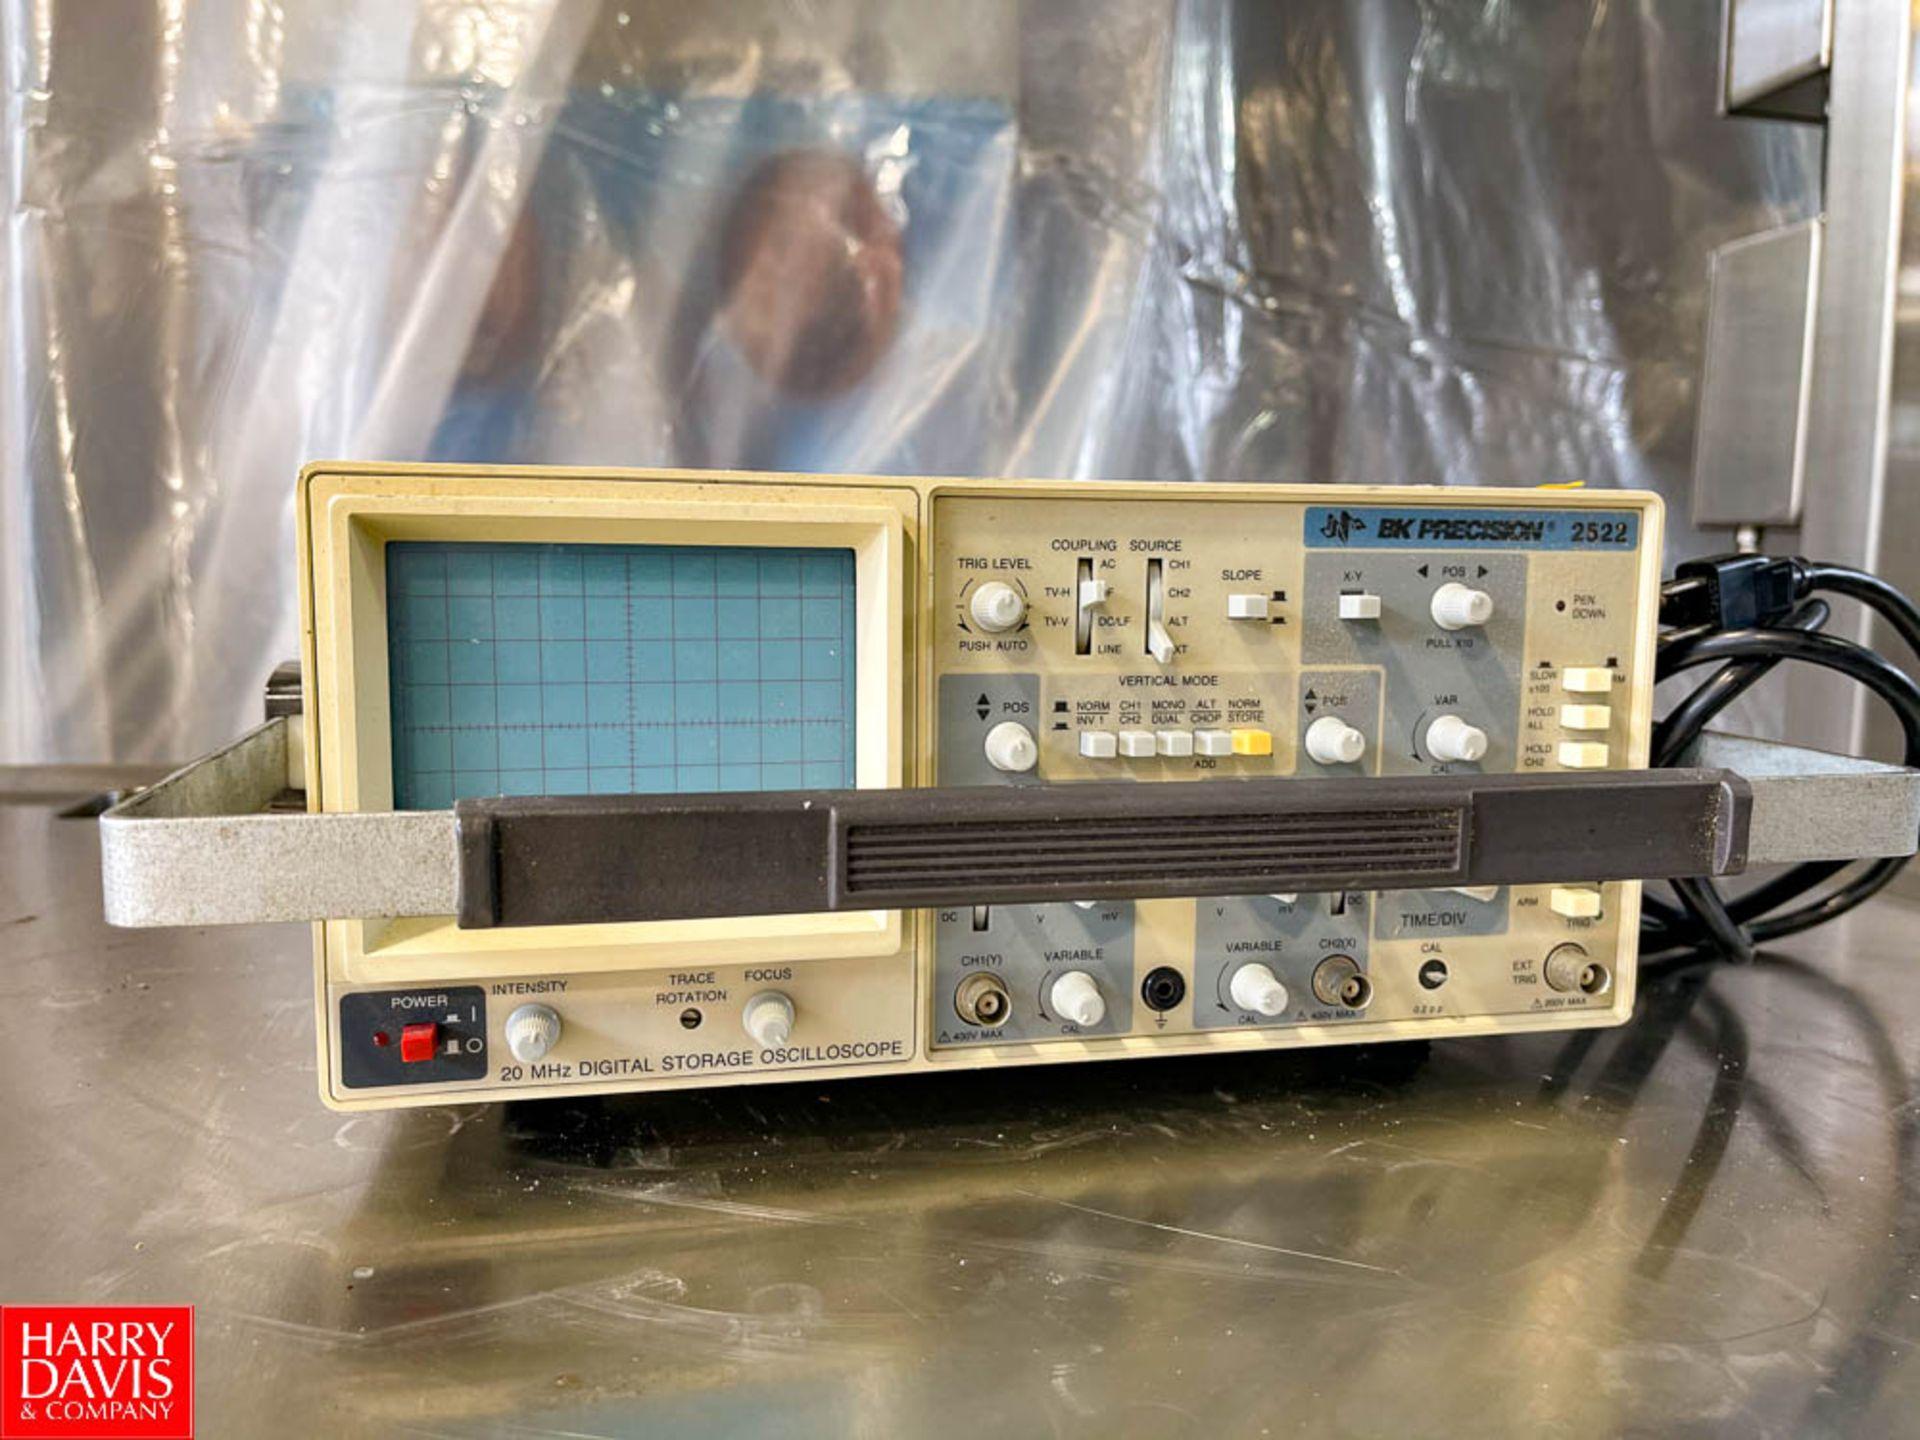 BK Precision Digital Storage Oscilloscope Model 2522